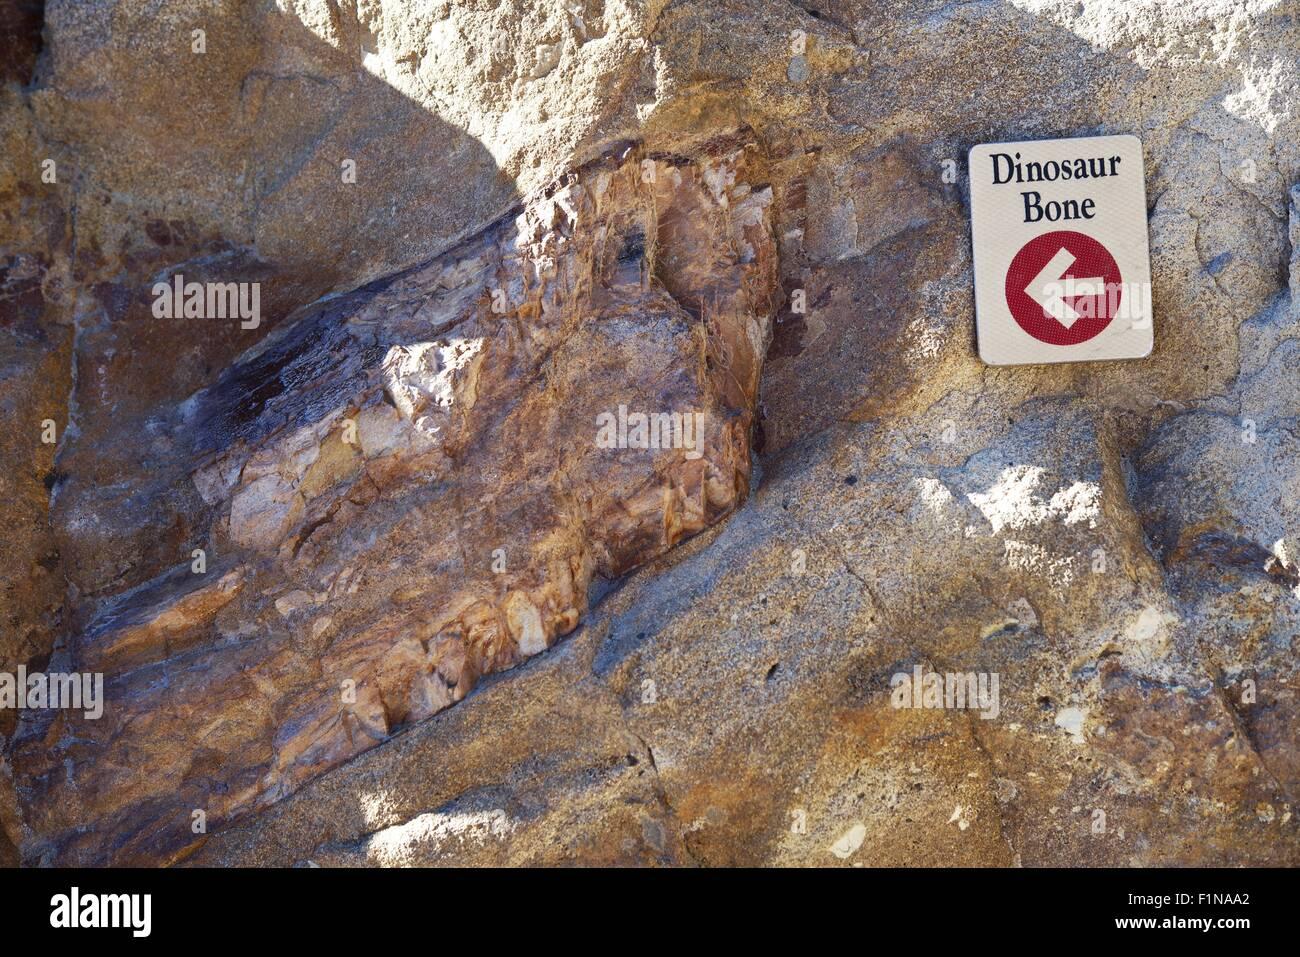 Dinosaur Bones Fossil in Colorado, United States. - Stock Image